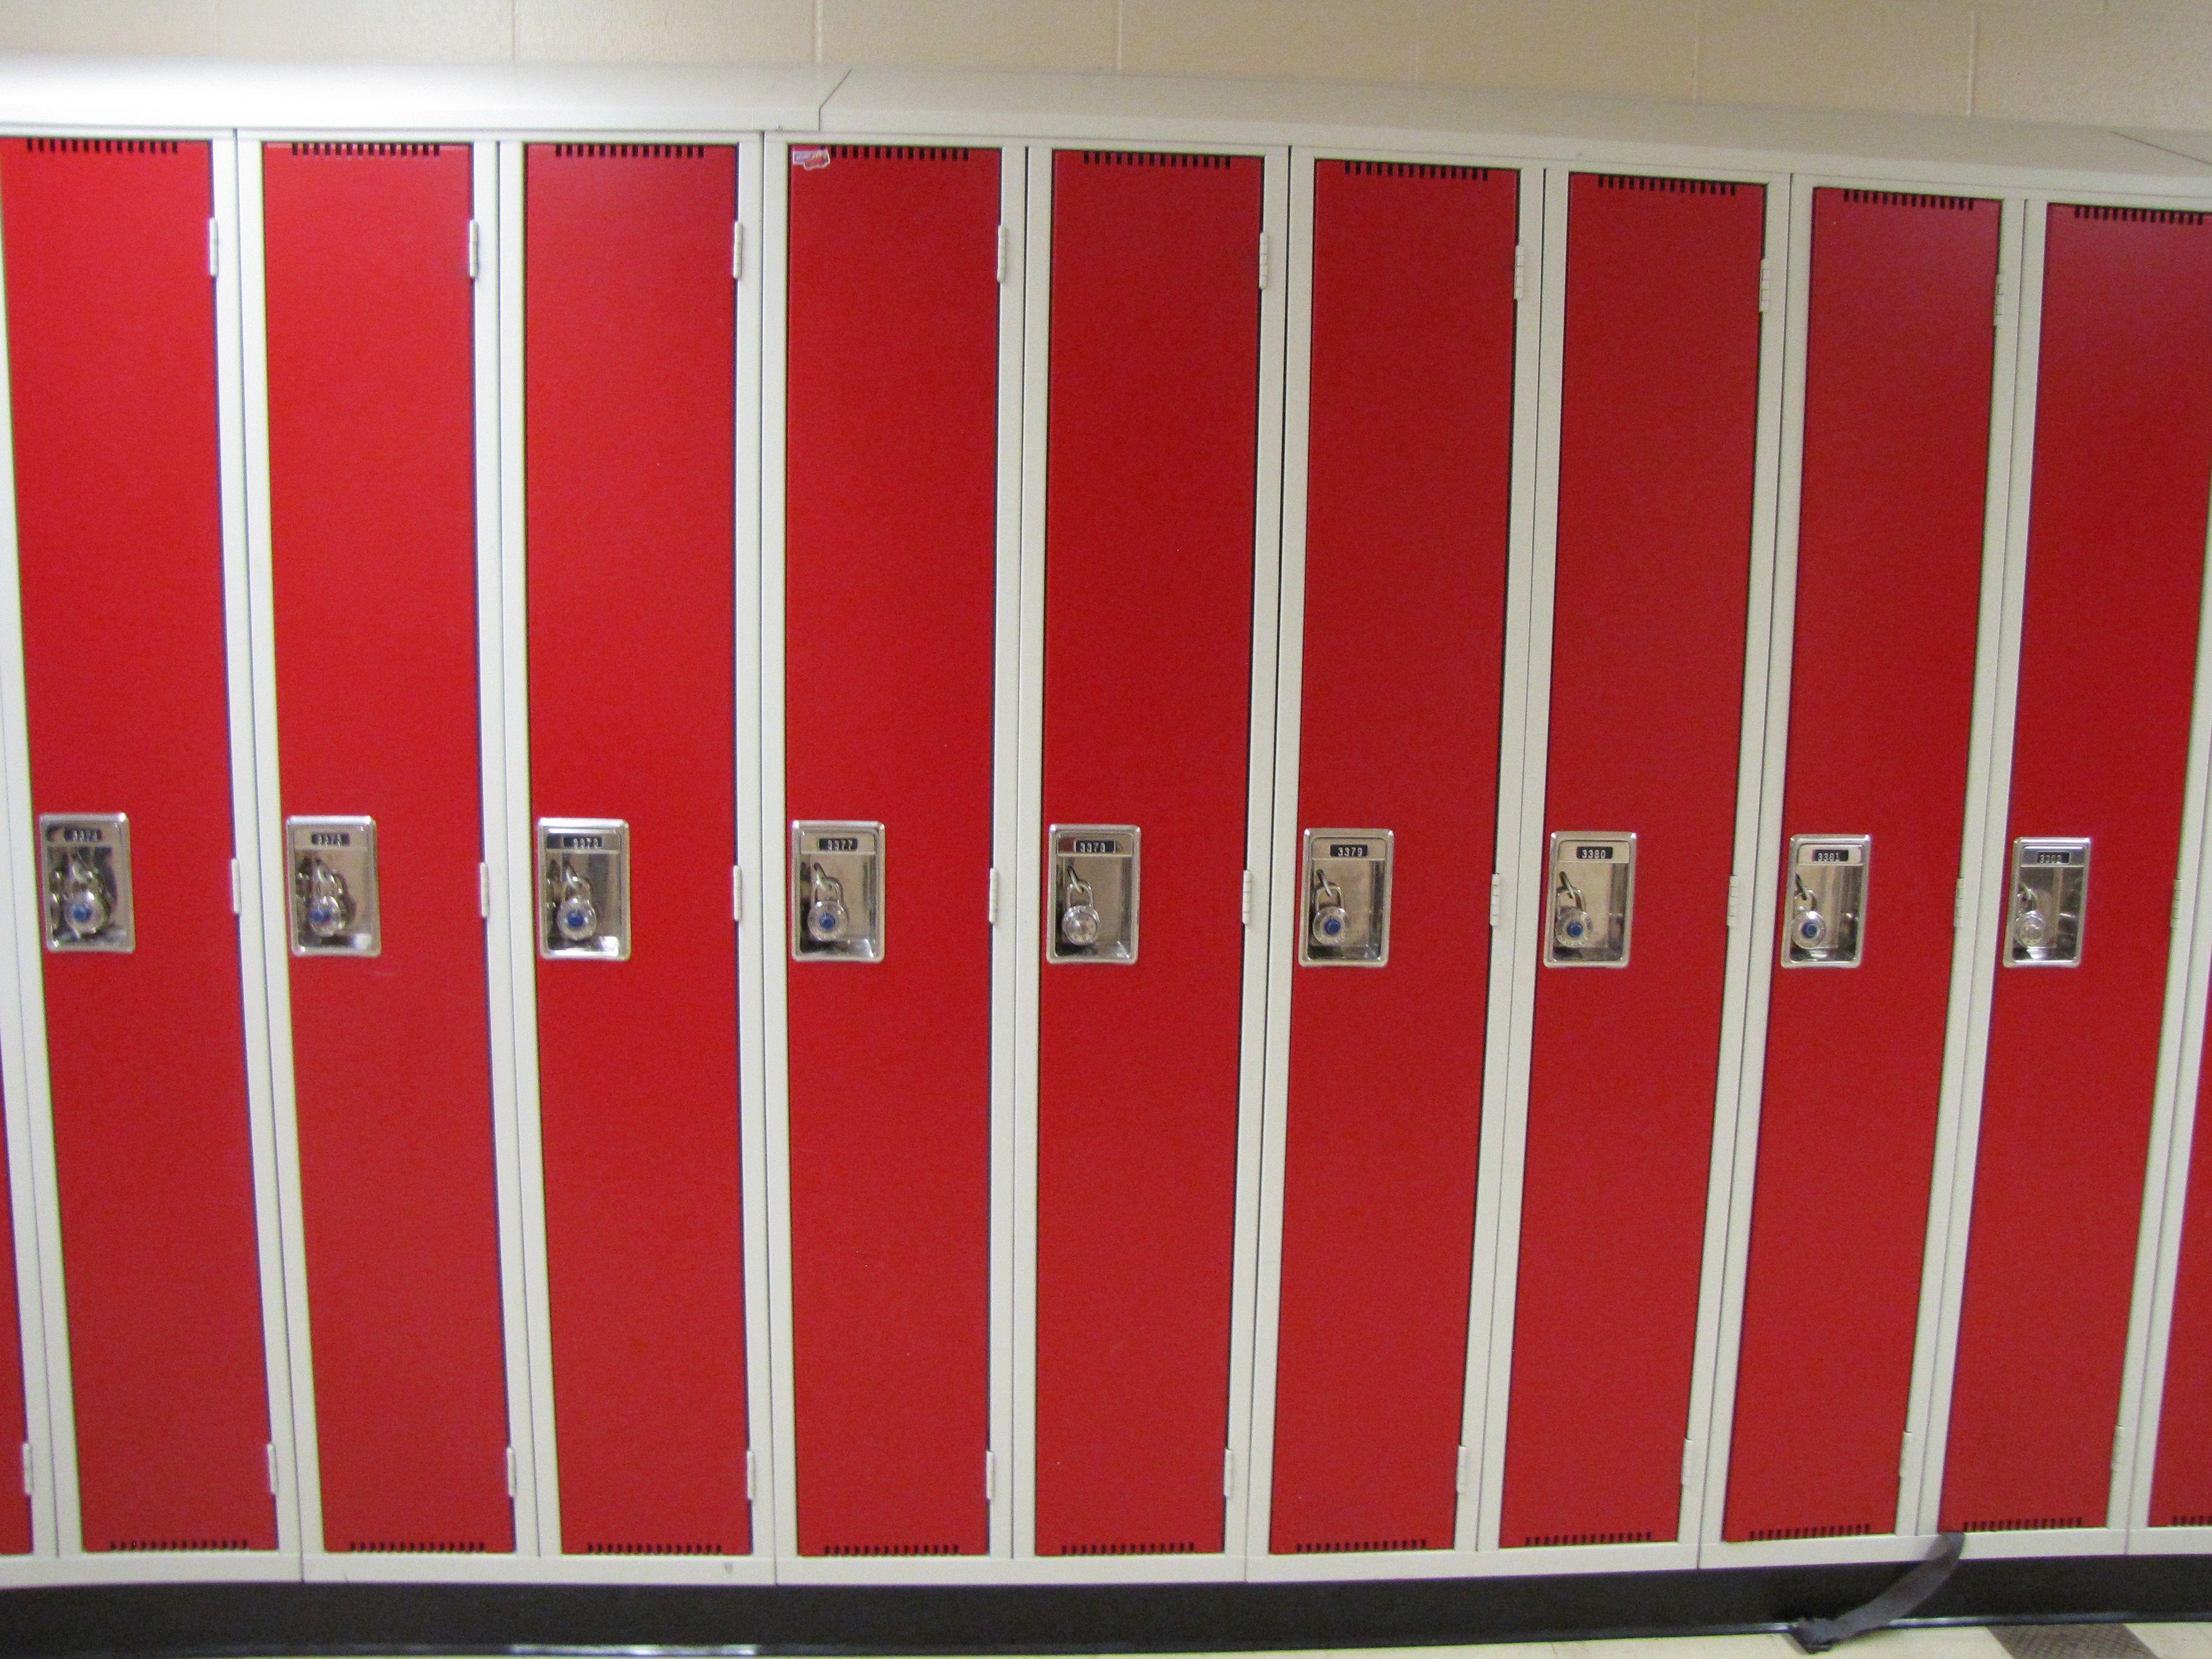 red lockers Locker storage, Lockers, Home decor